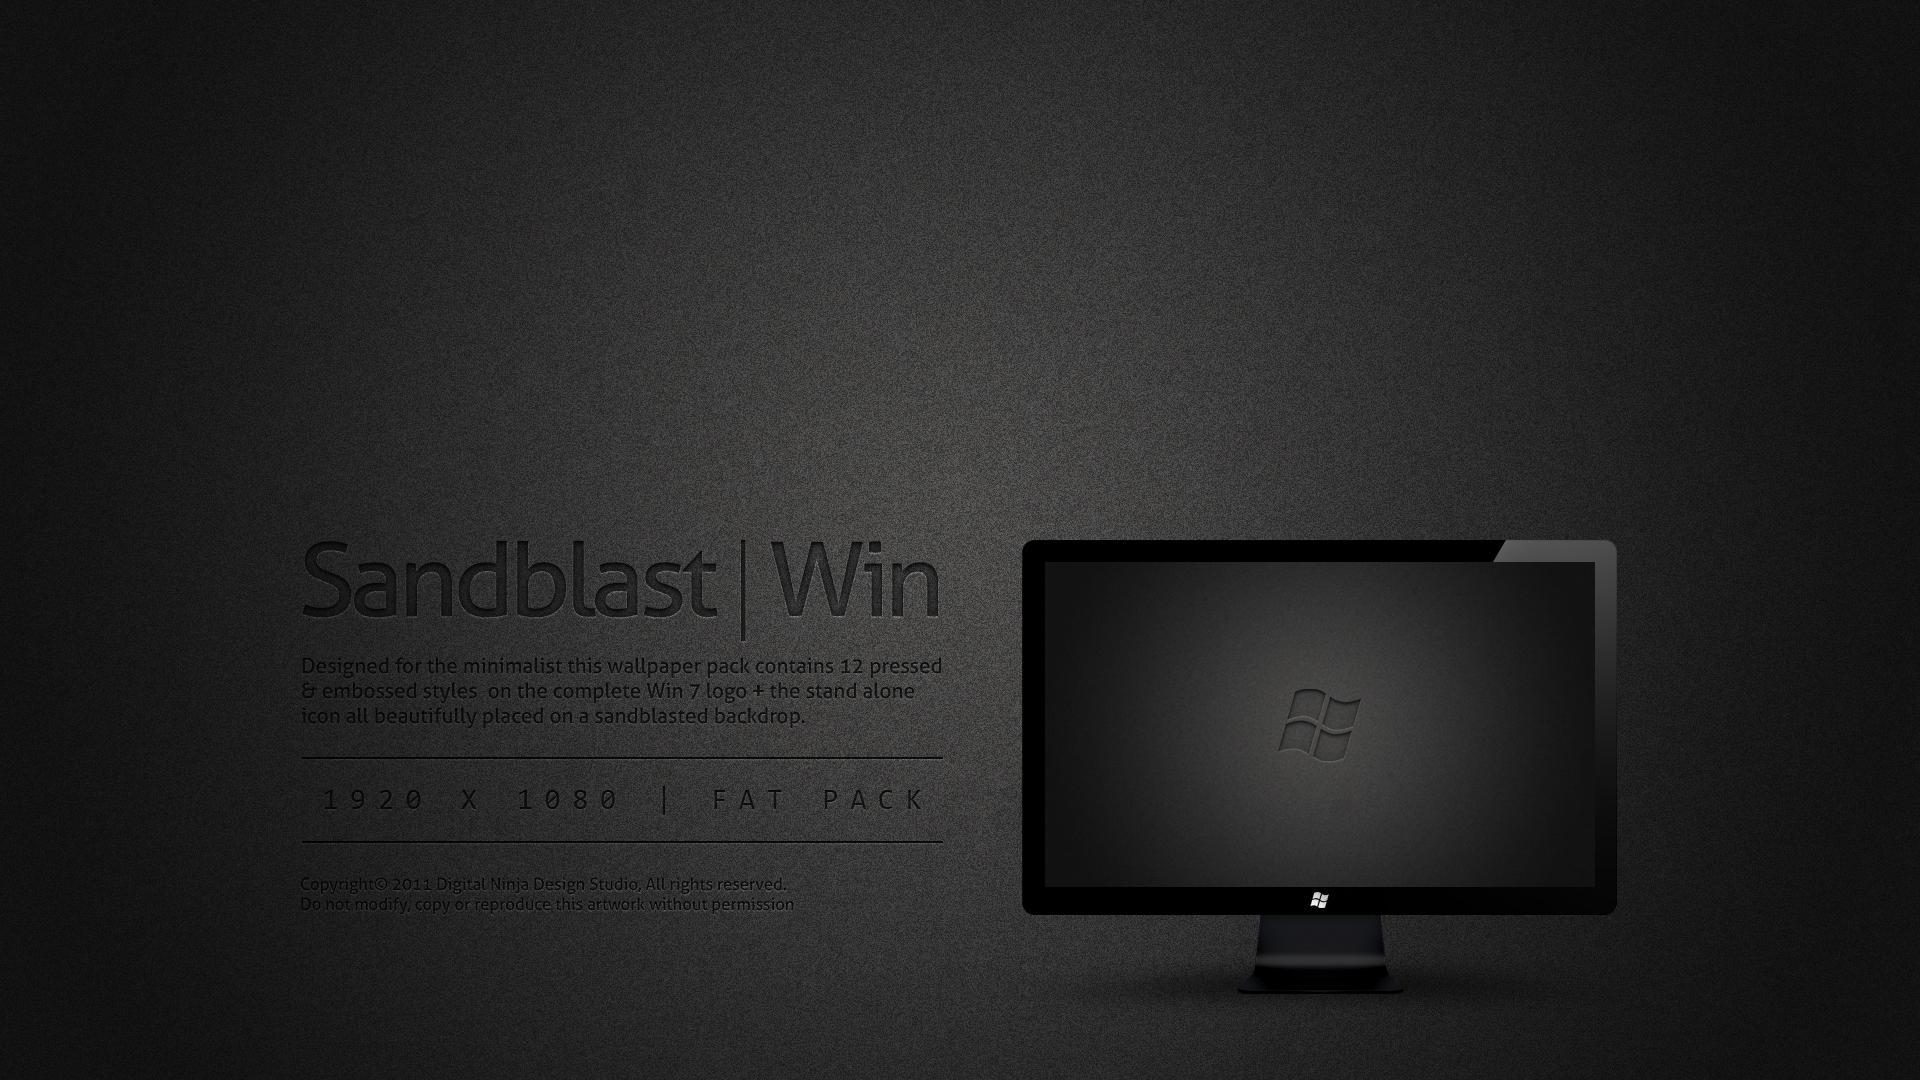 Sandblast Win 7 by DNStudios